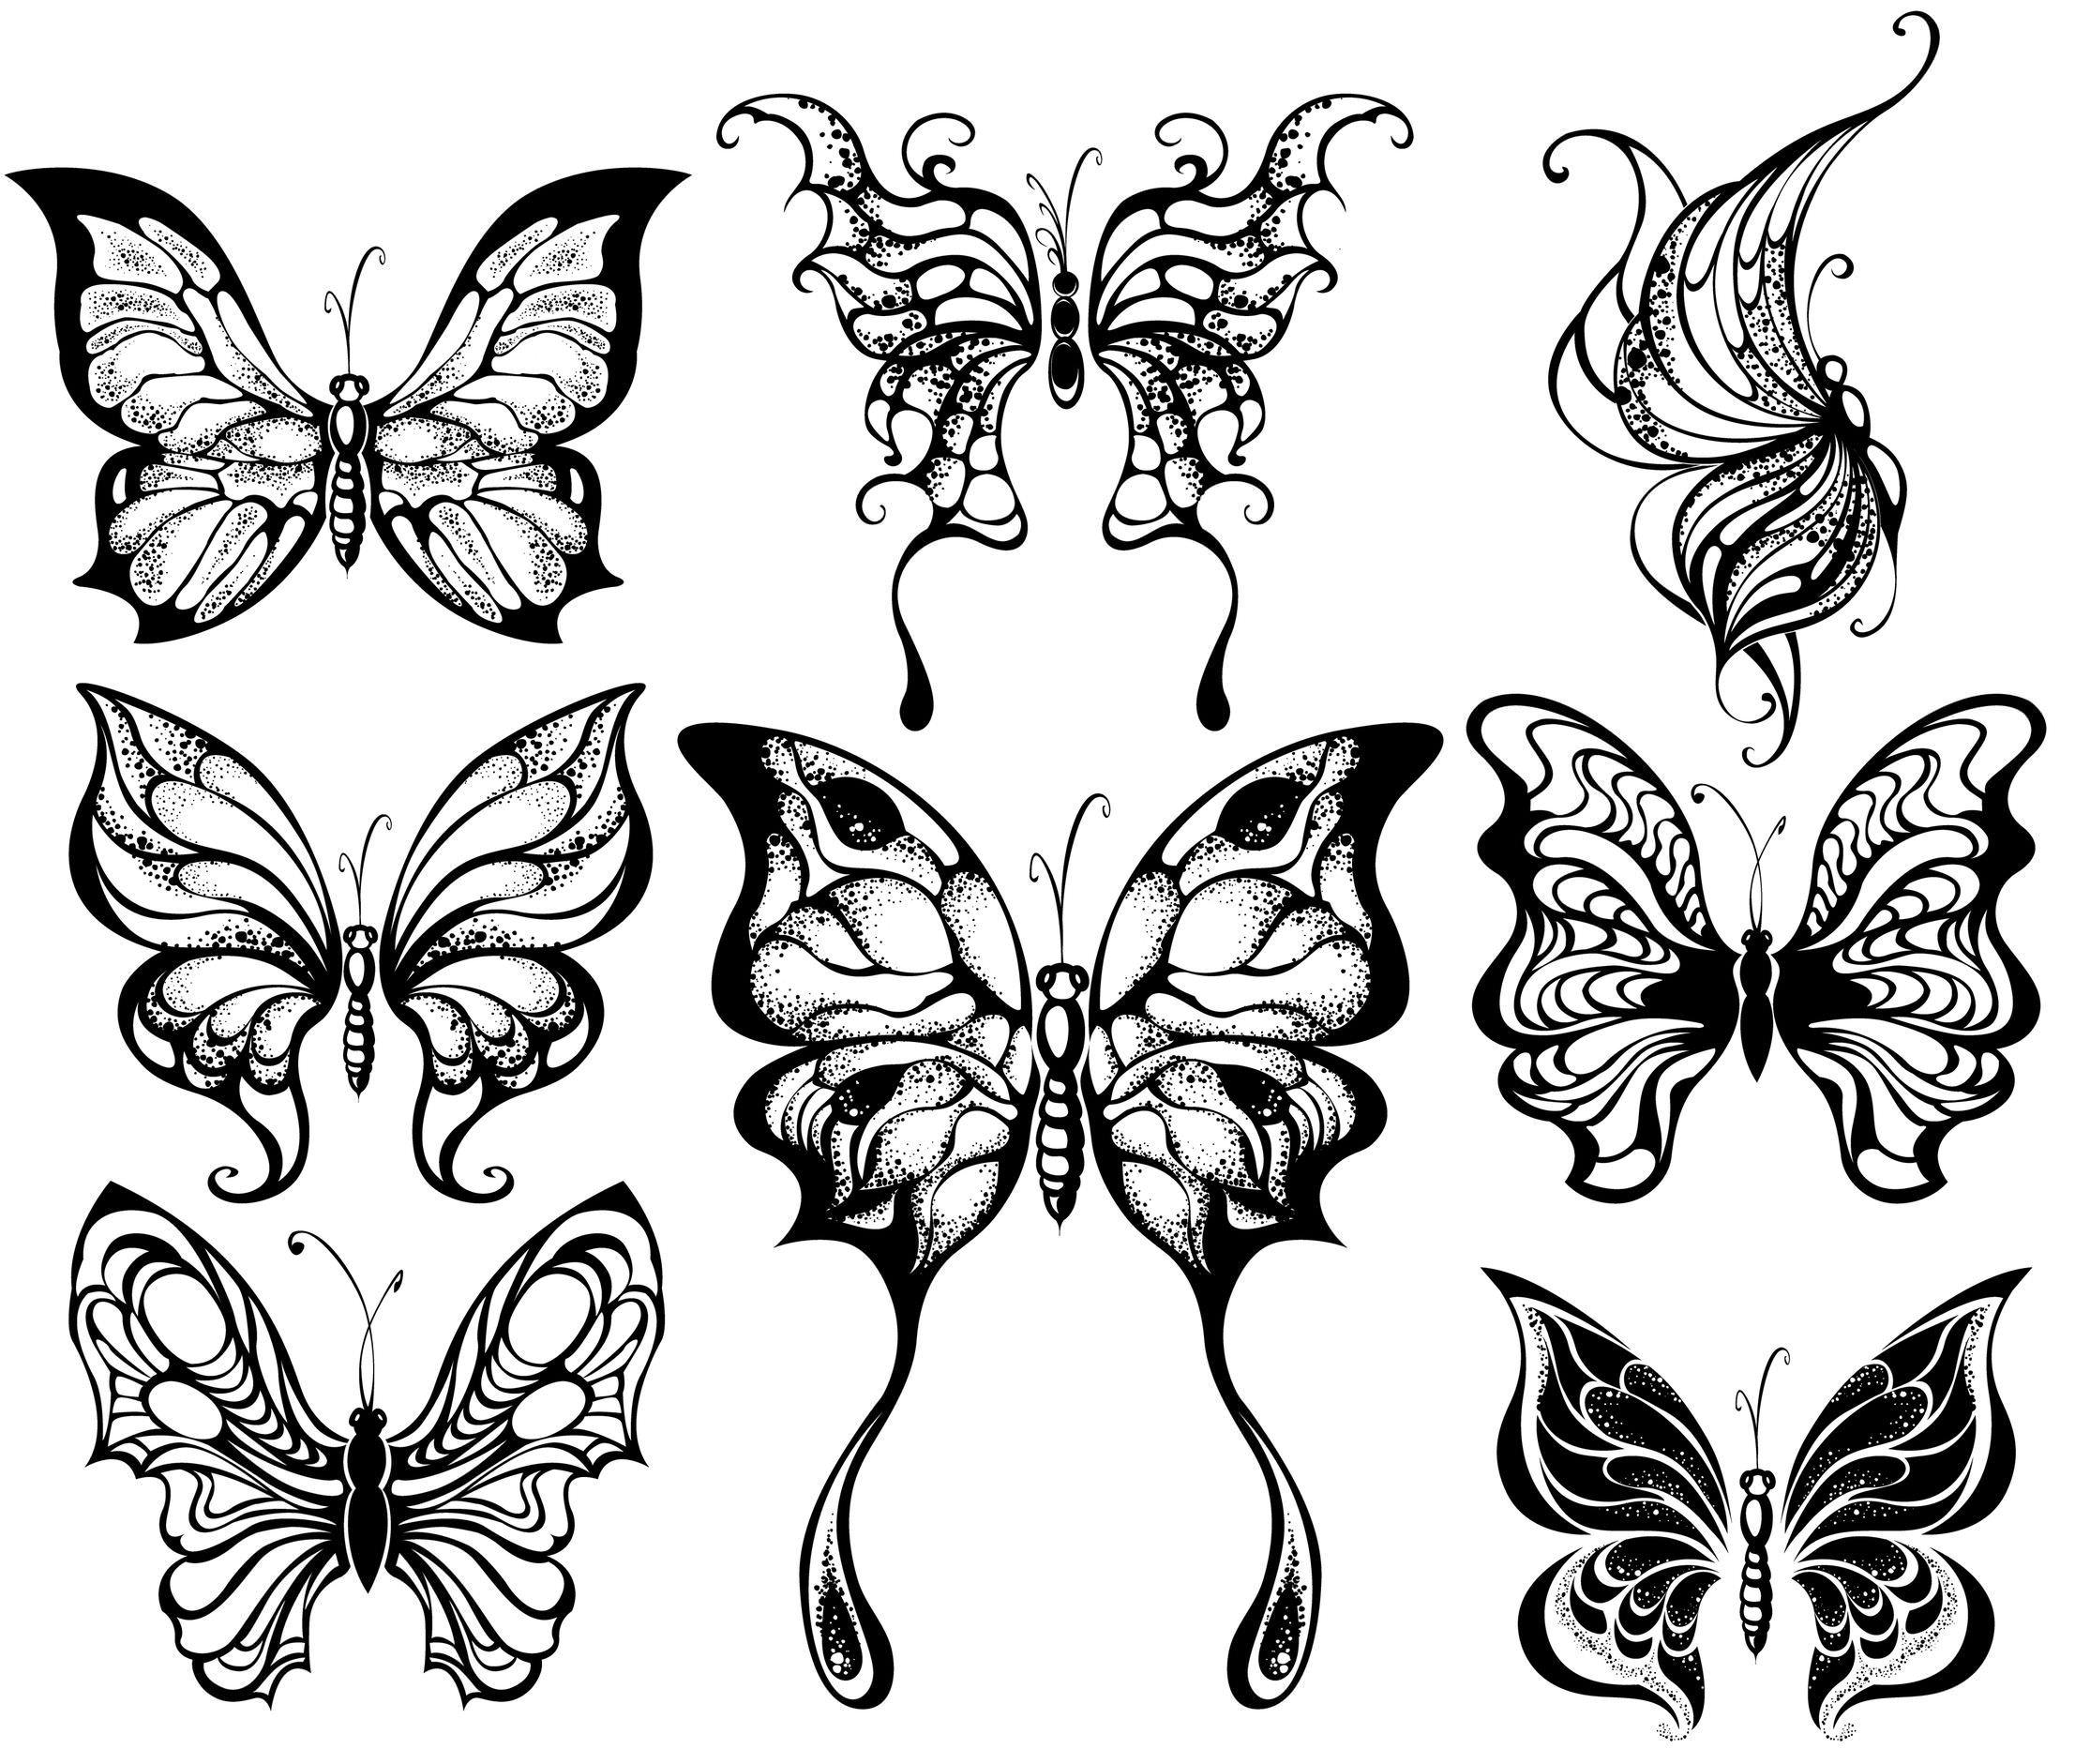 Coloriage Animaux Feeriques.Coloriage Papillons Feeriques Coloriage Papillon Dessin